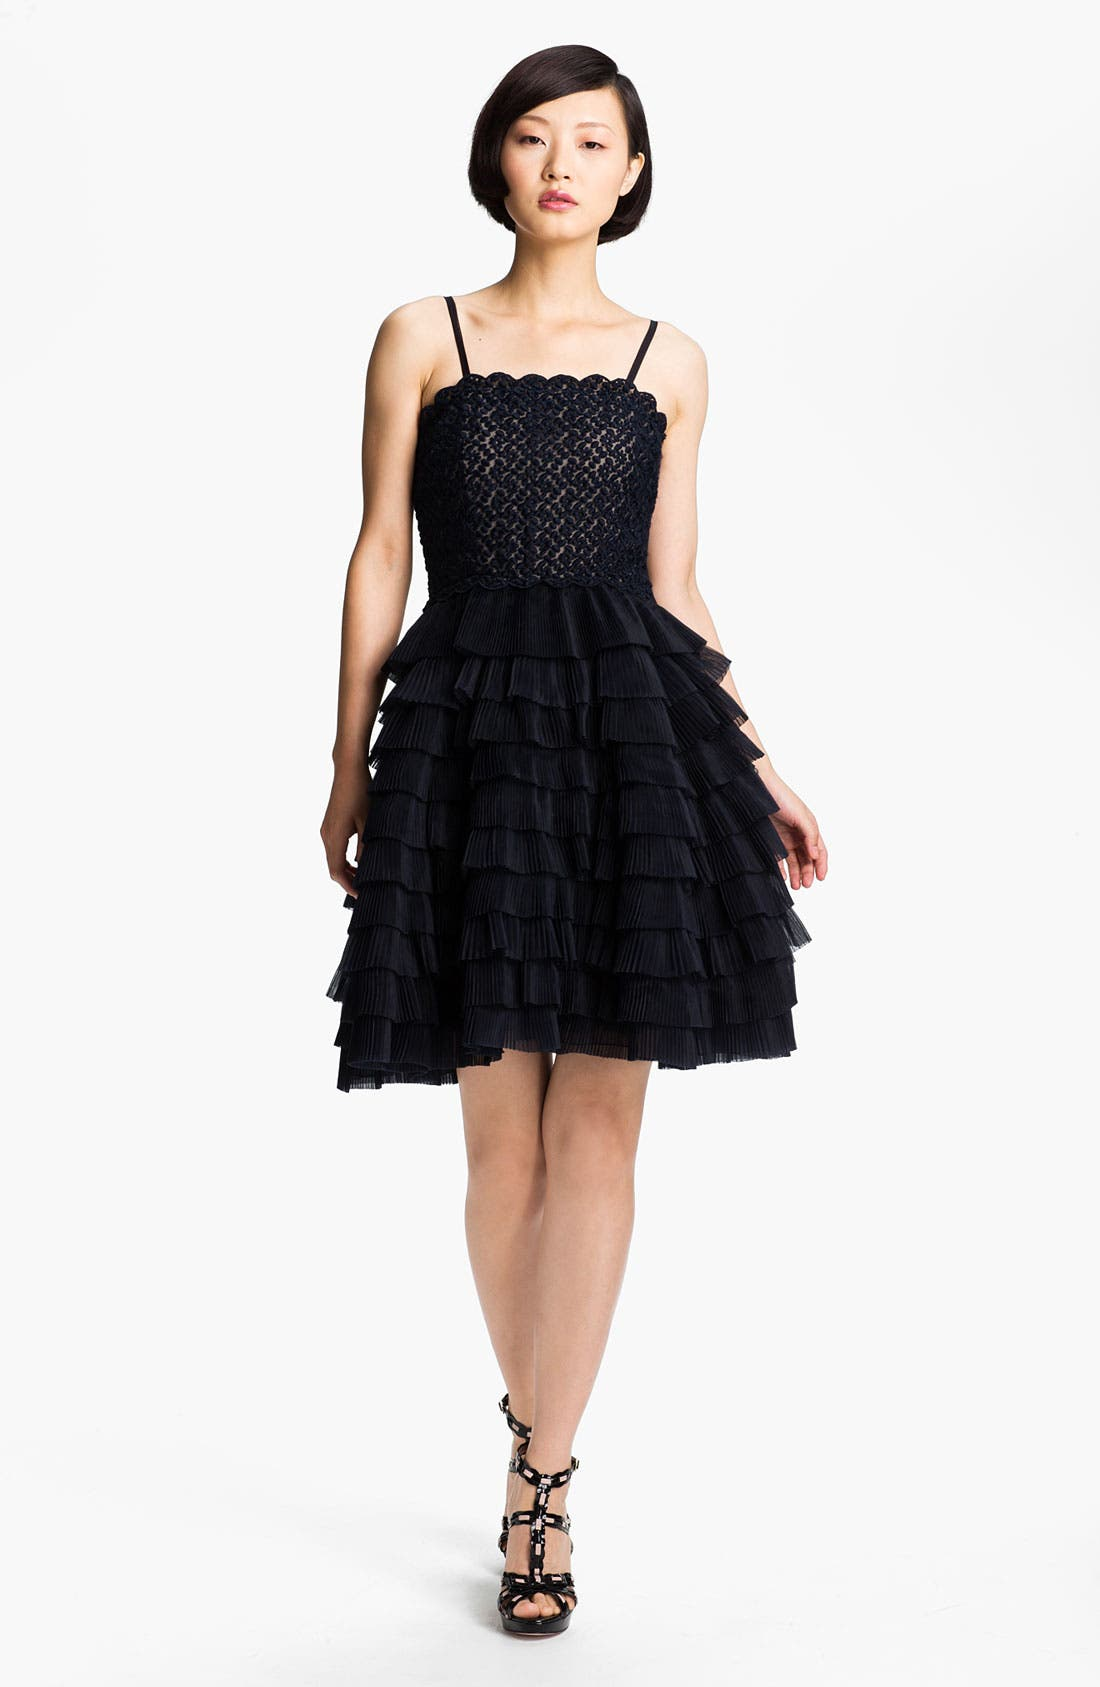 Alternate Image 1 Selected - RED Valentino Full Skirt Organza Dress